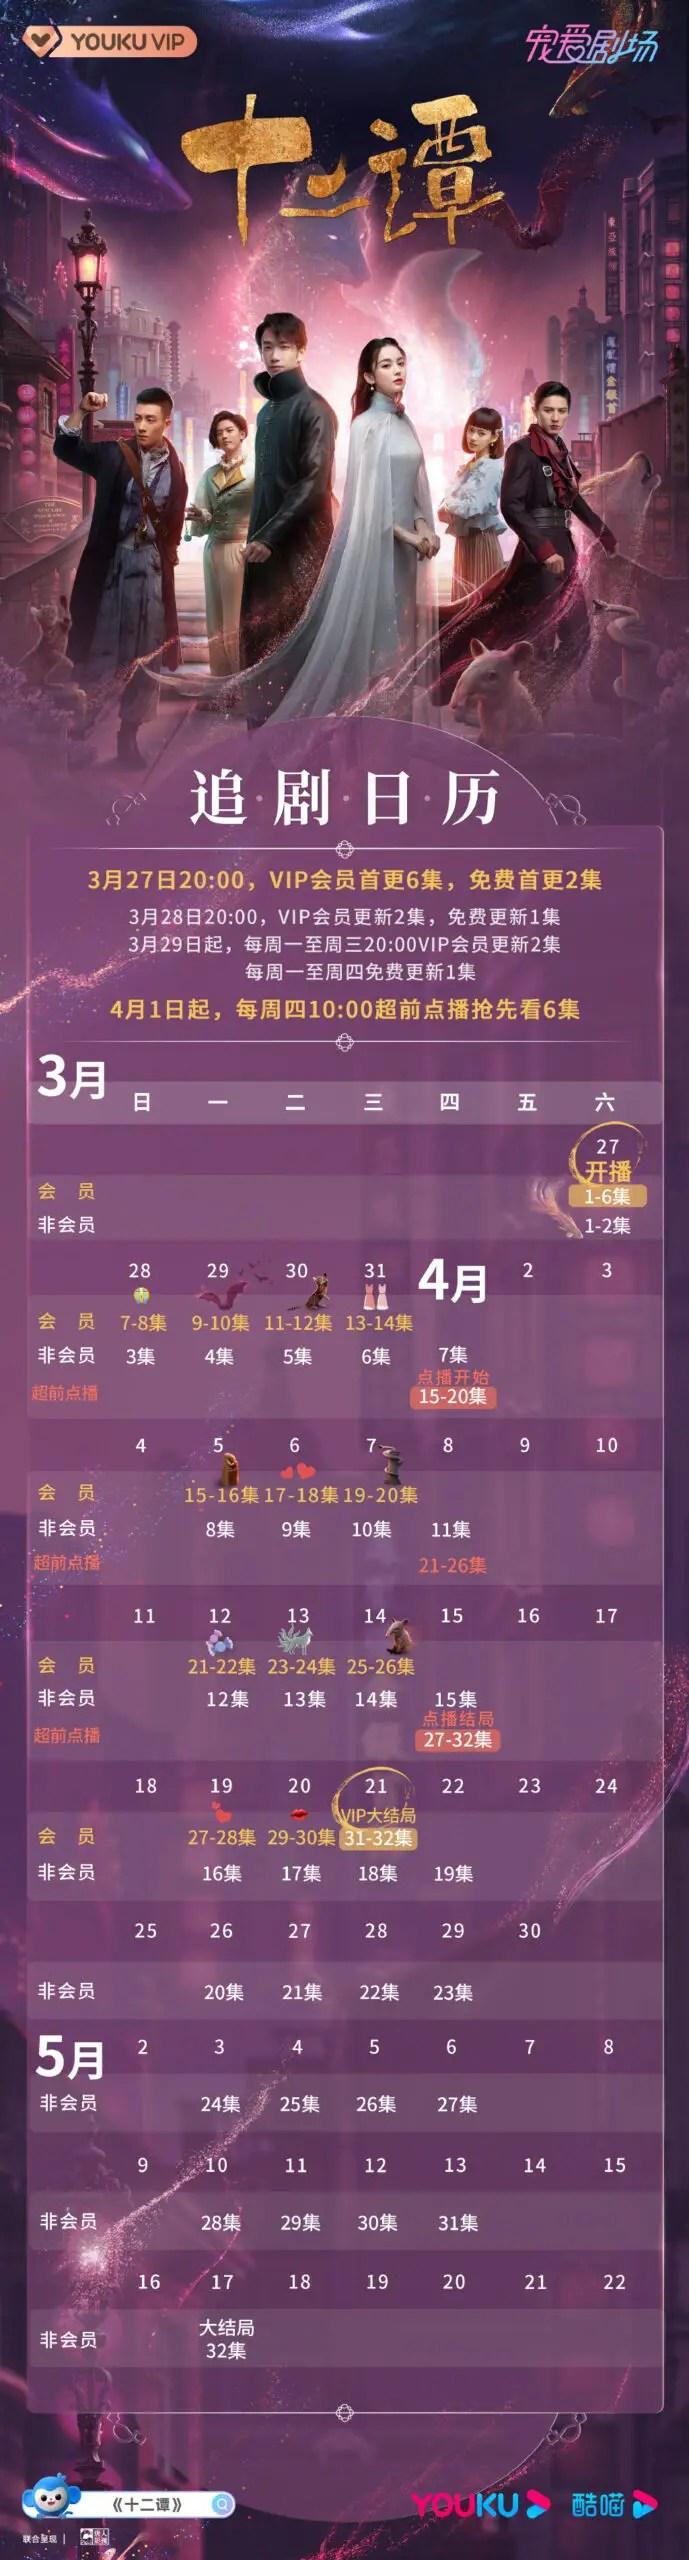 Twelve Legends Chinese Drama Airing Calendar